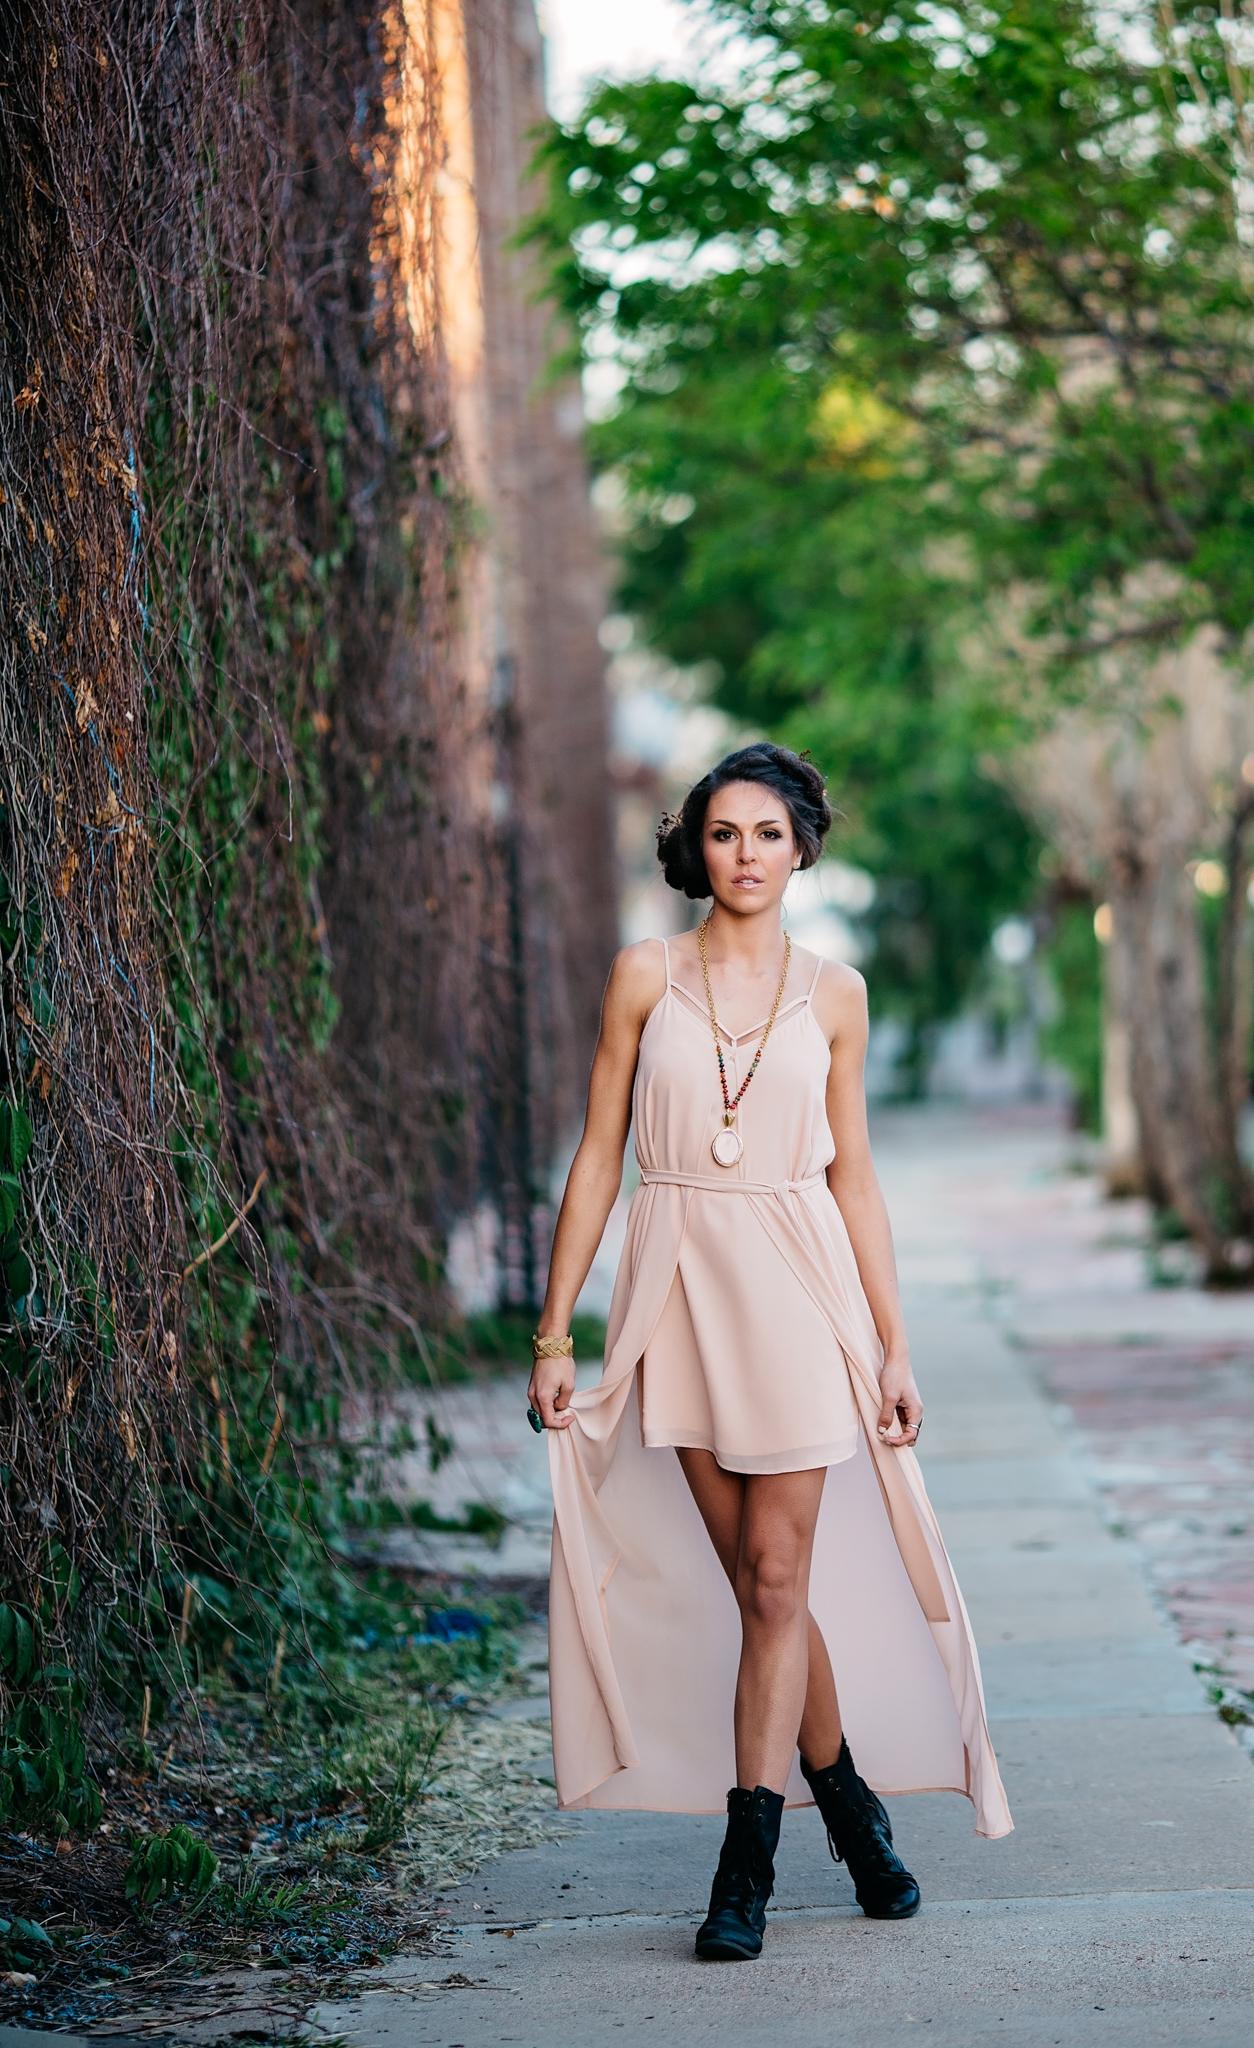 denver fashion photography (4 of 6)